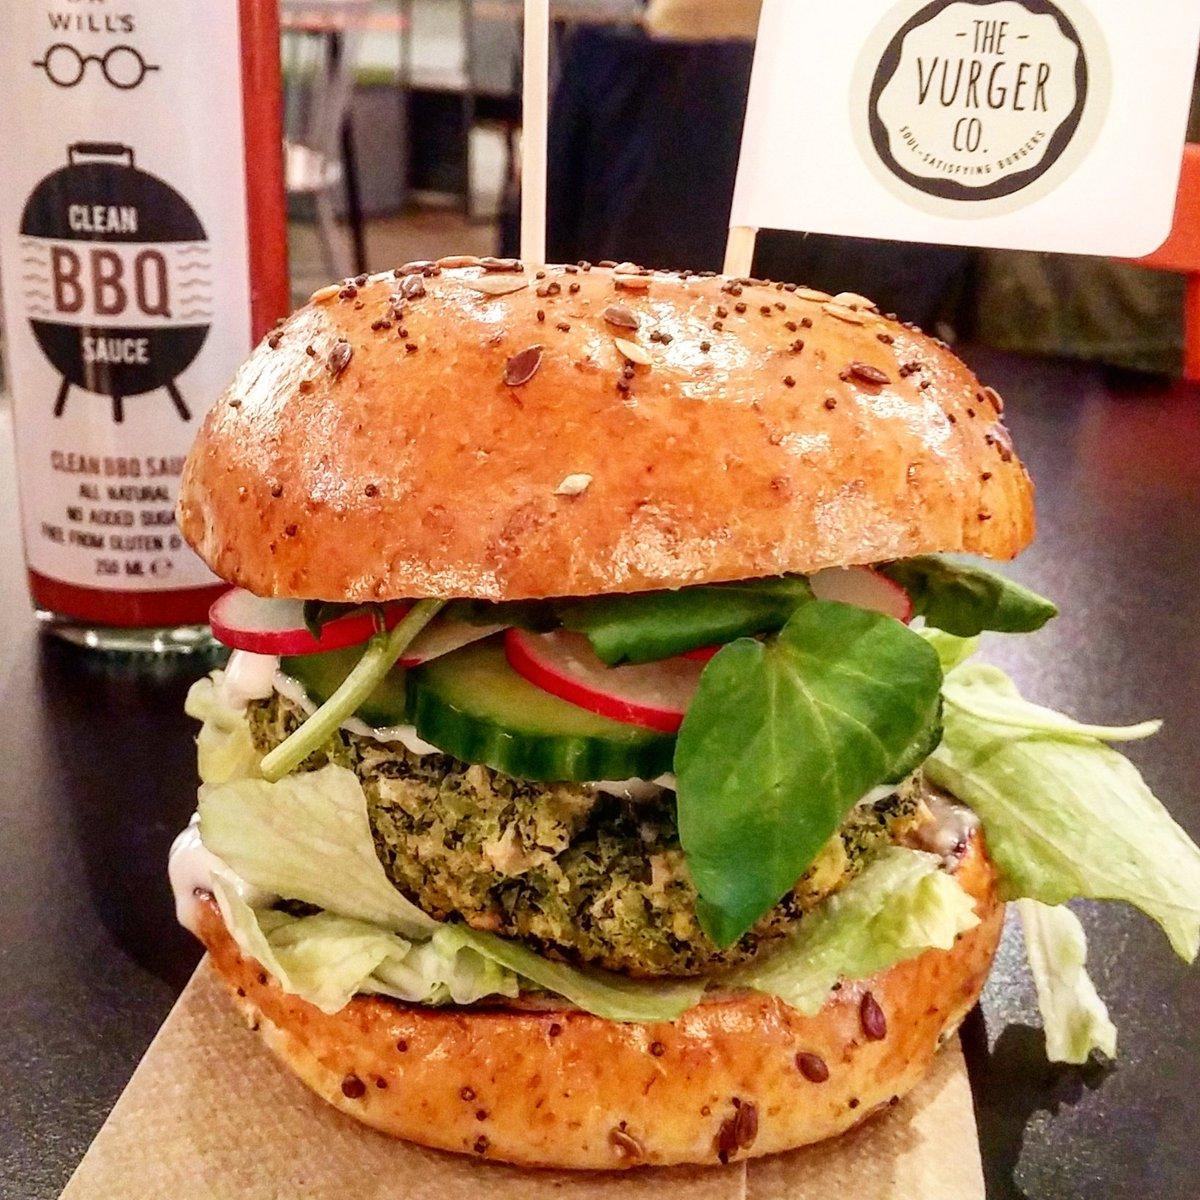 From 5pm - Try @TheVurgerCo &#39;s great #vegan #burgers at @pillboxkitchen #E2  http://www. londonpopups.com/2017/01/the-vu rger-cos-vegan-burger-nights-at.html &nbsp; …  Saturdays, til 4th<br>http://pic.twitter.com/JTKvAFfvpd